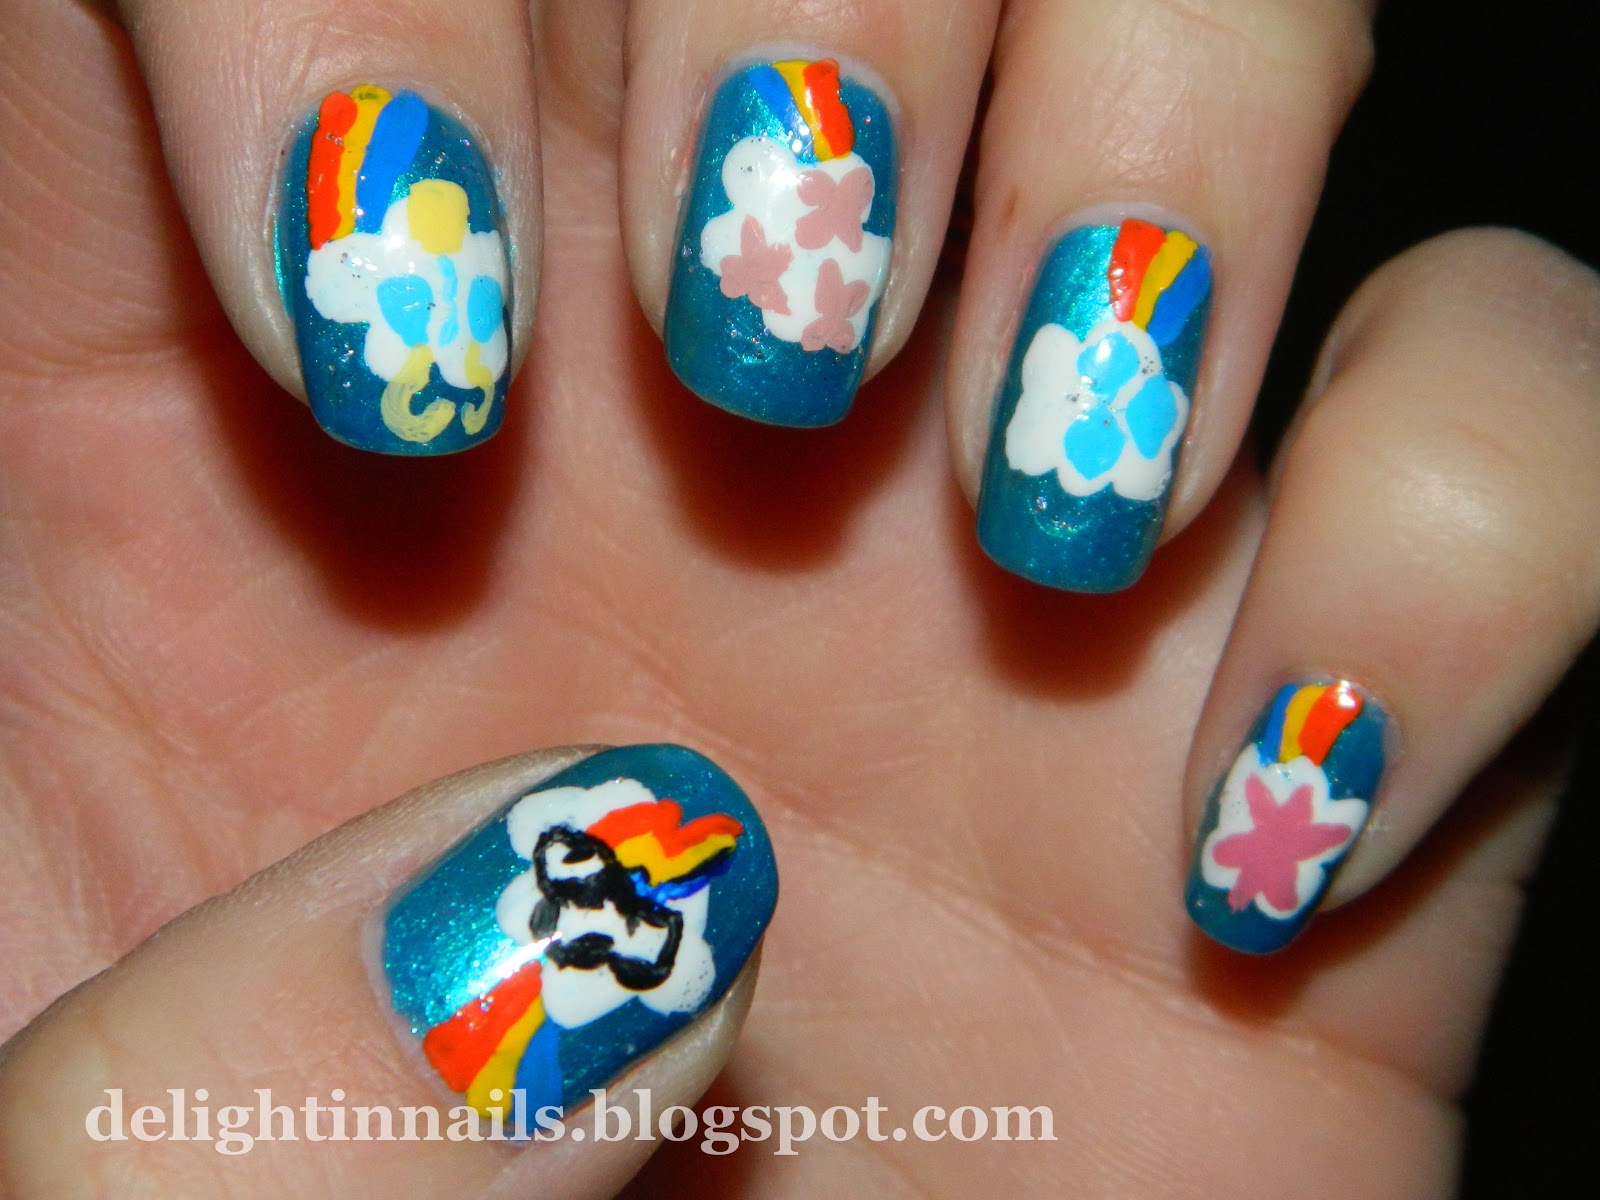 Delight In Nails: My Little Pony Nail Art for Rainbow Honey Nail Art ...